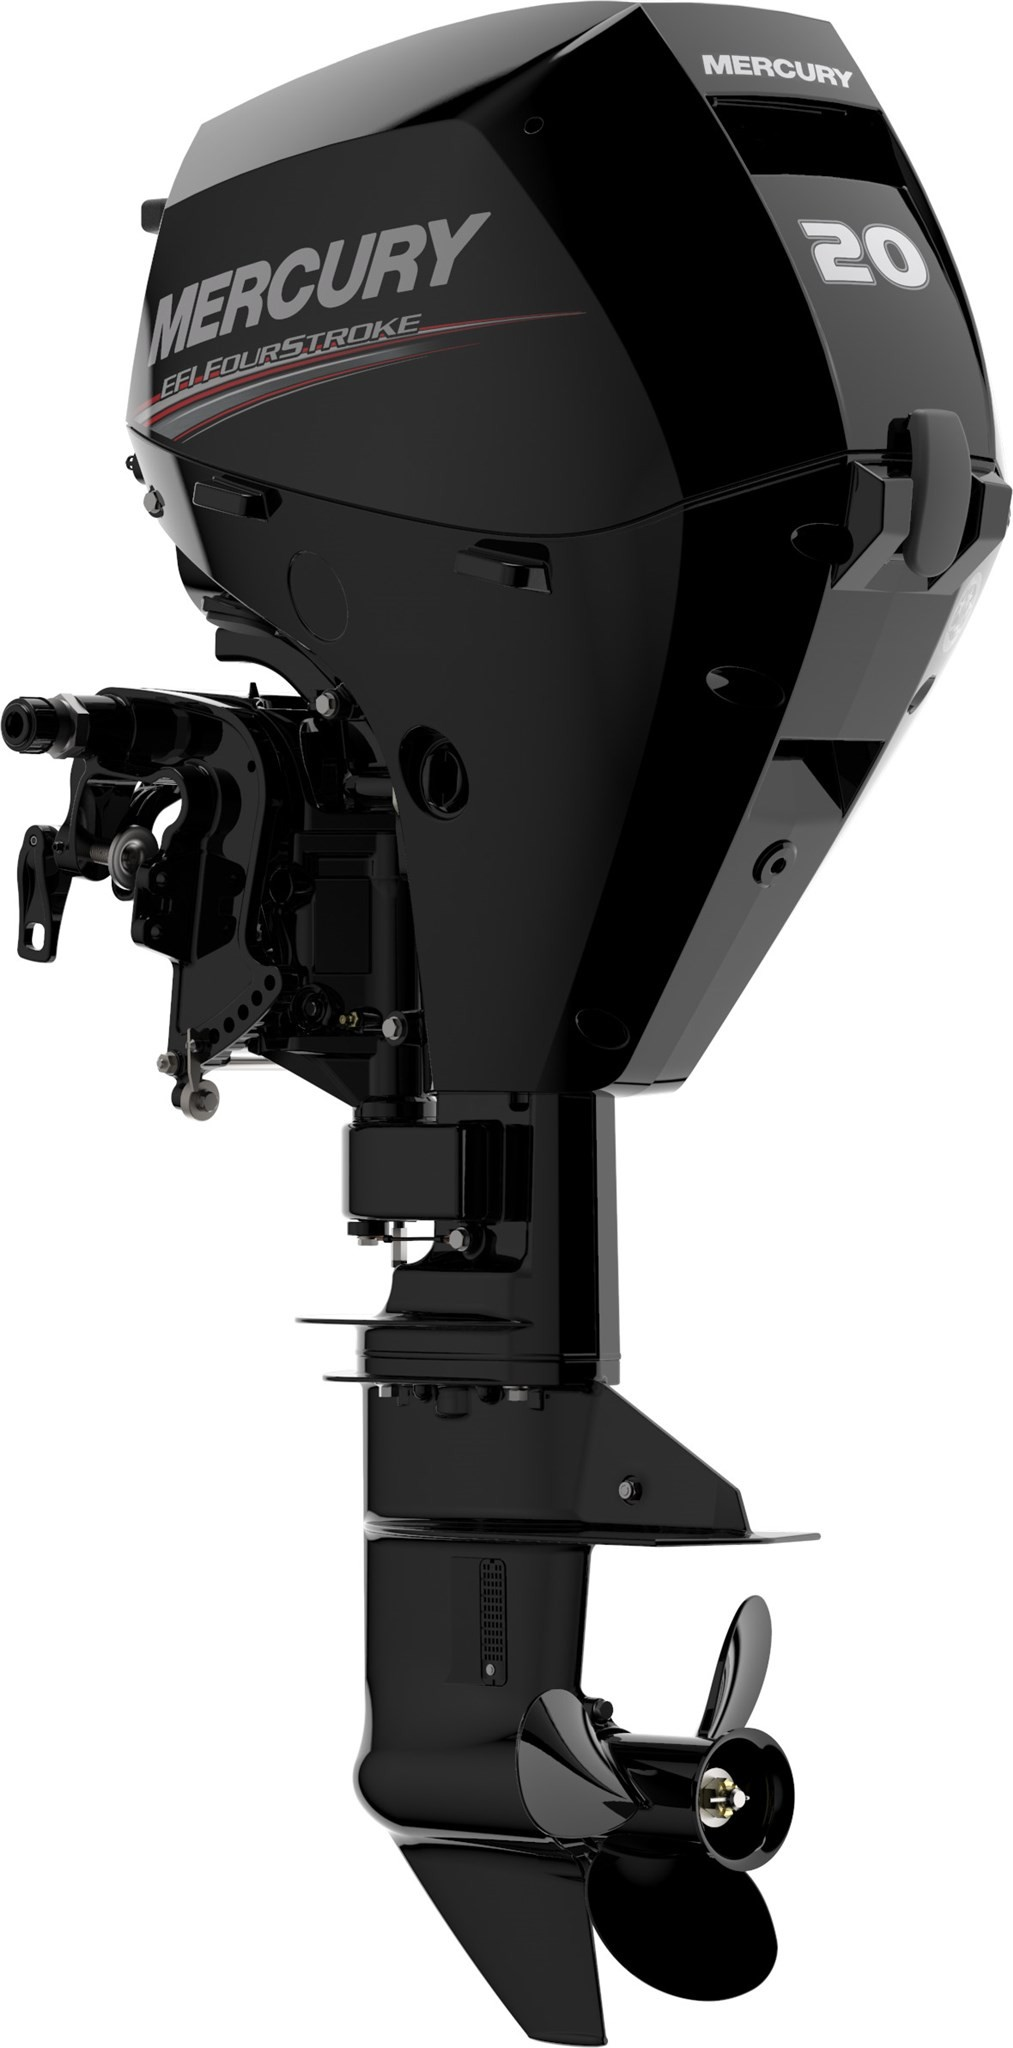 Лодочный мотор Mercury F20 EL EFI (RC)